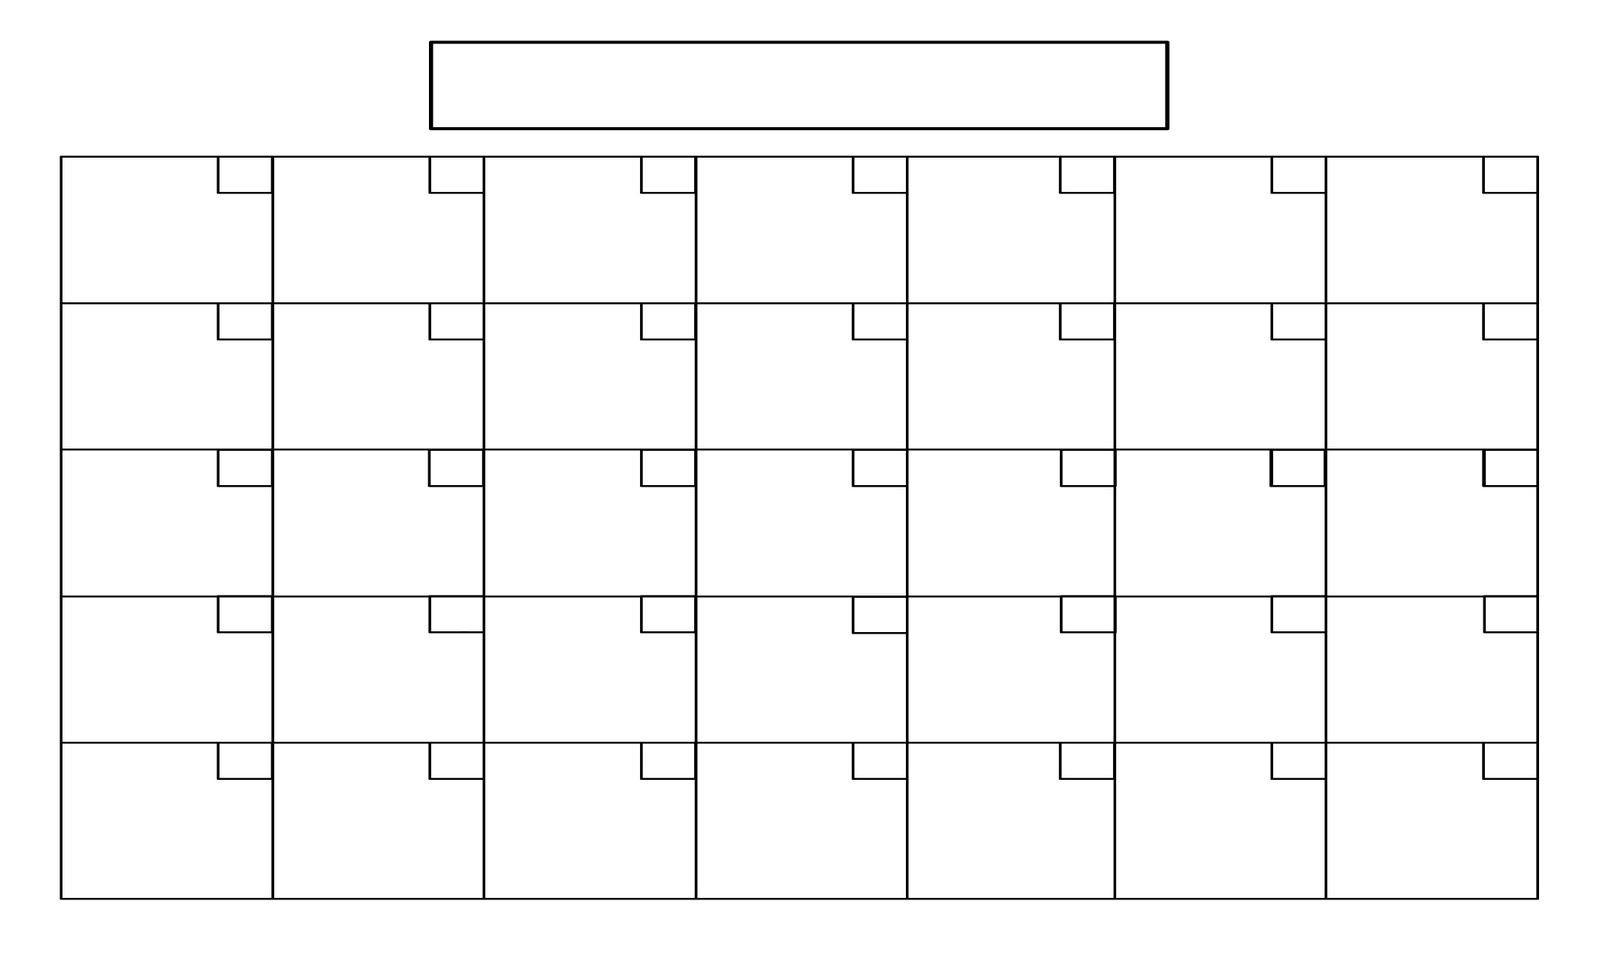 Printable+Full+Page+Blank+Calendar+Template | Boyscout  Full Page Blank Month Calendar